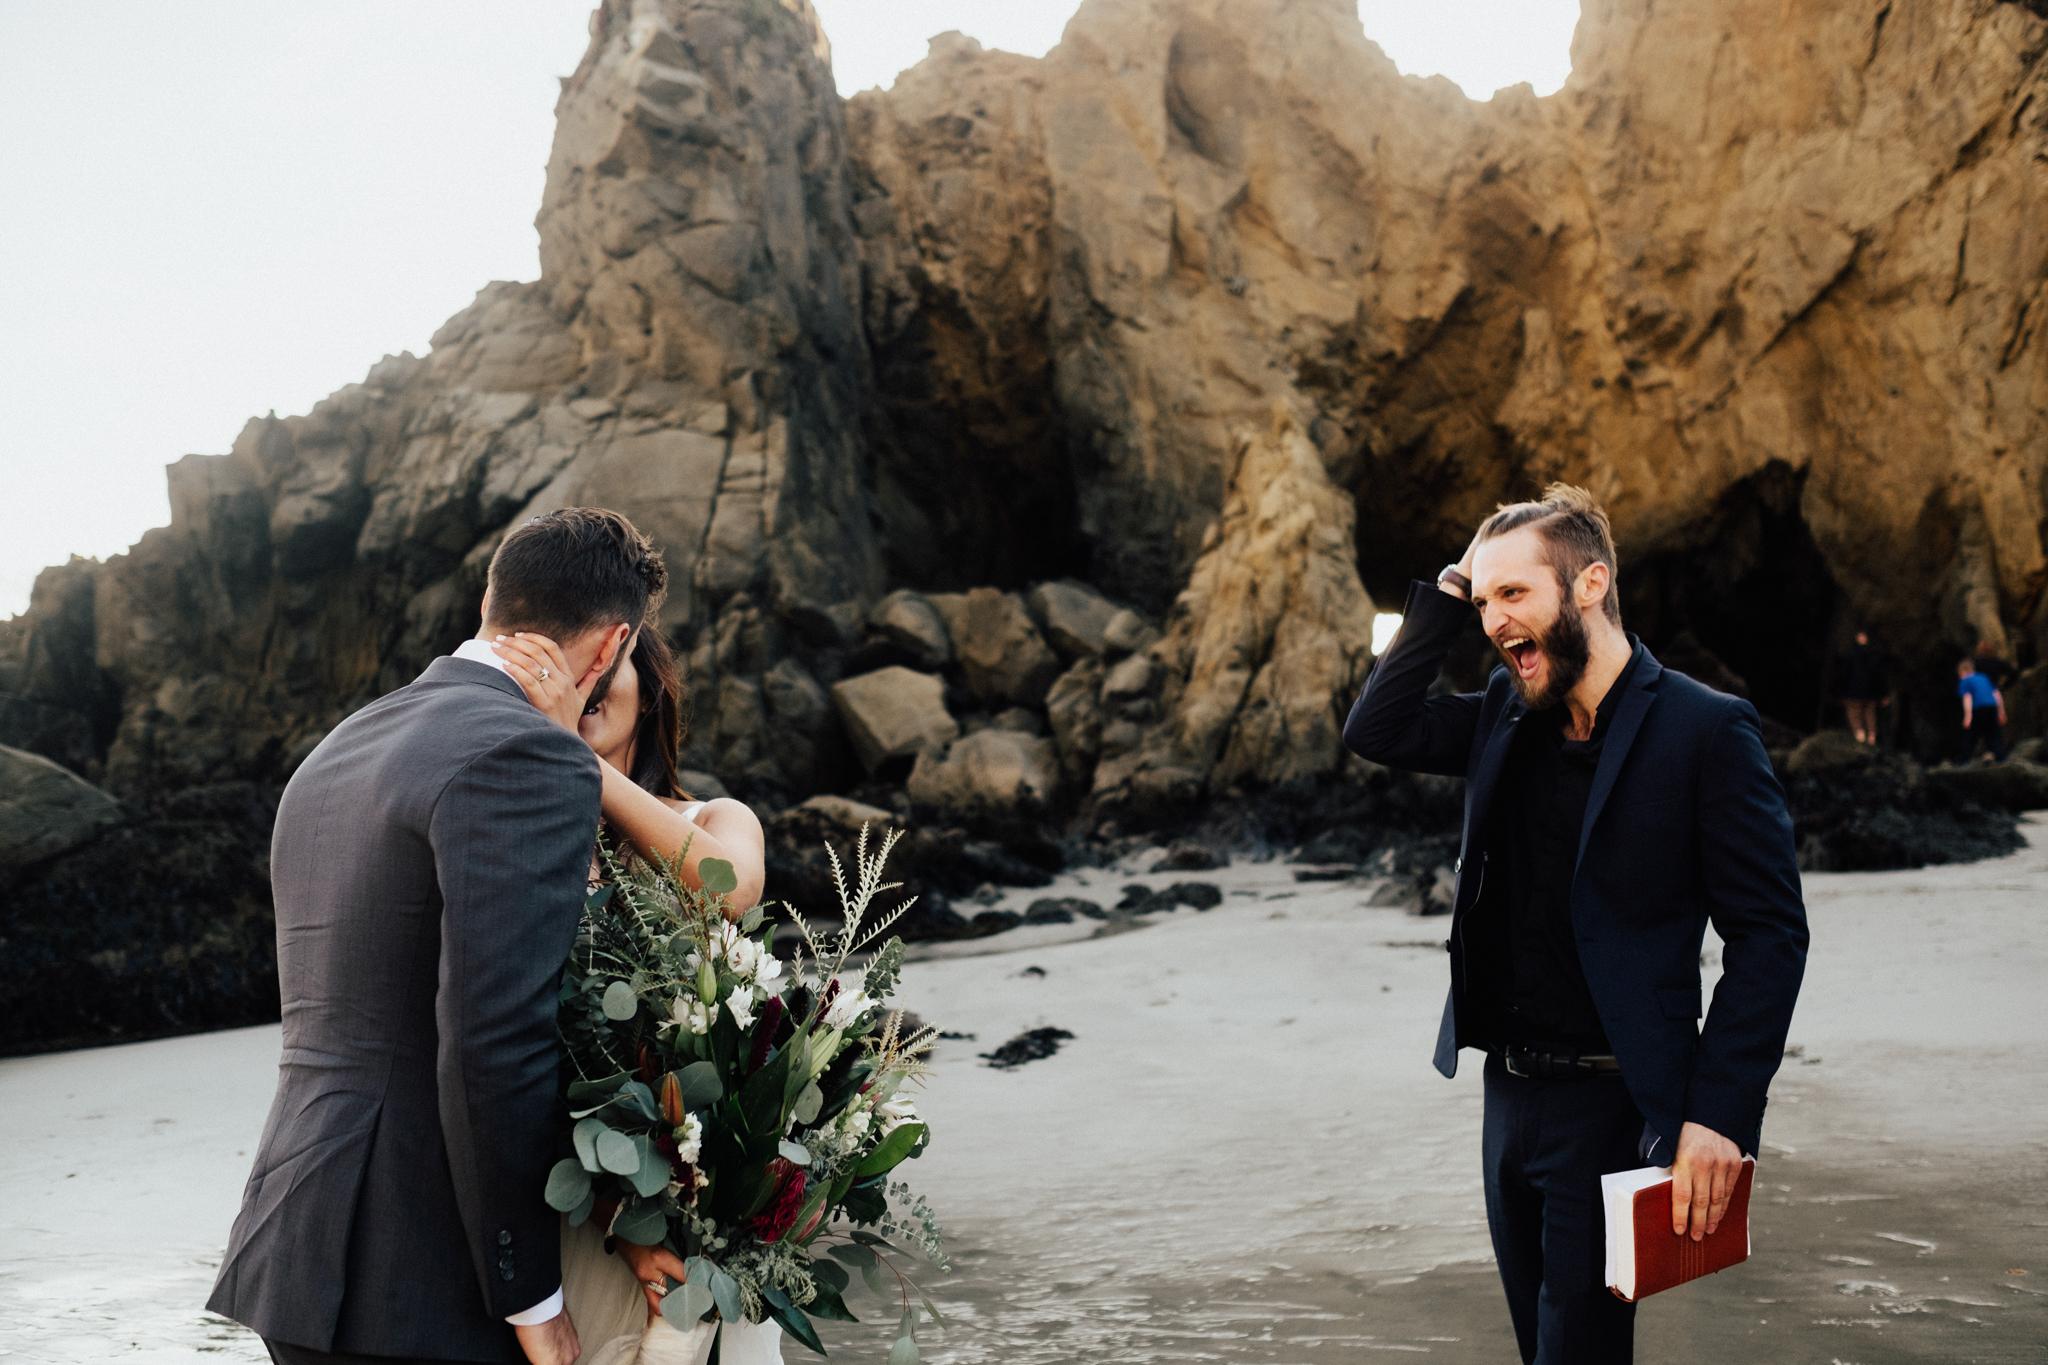 Arizona-Adventure-Elopement-Wedding-Photographer-38.jpg